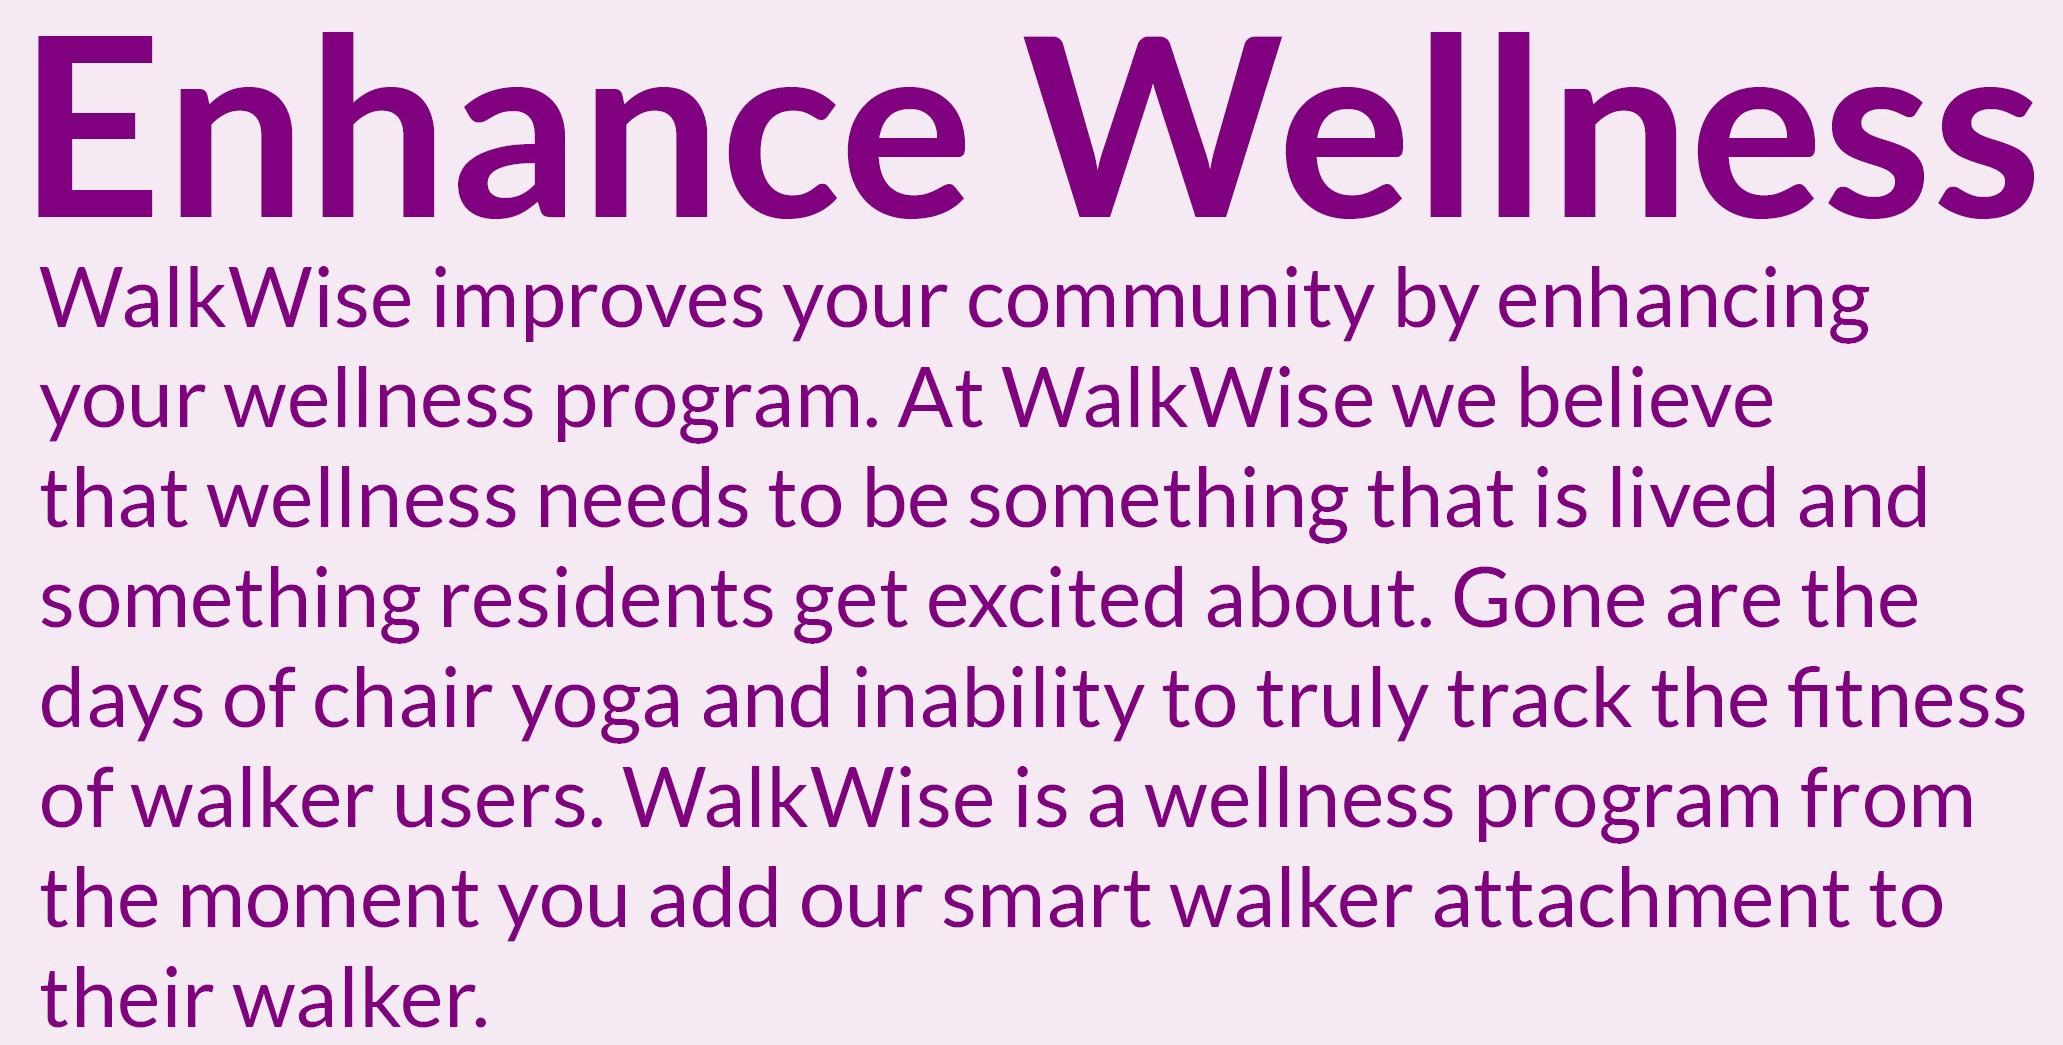 Enhance wellness.jpg